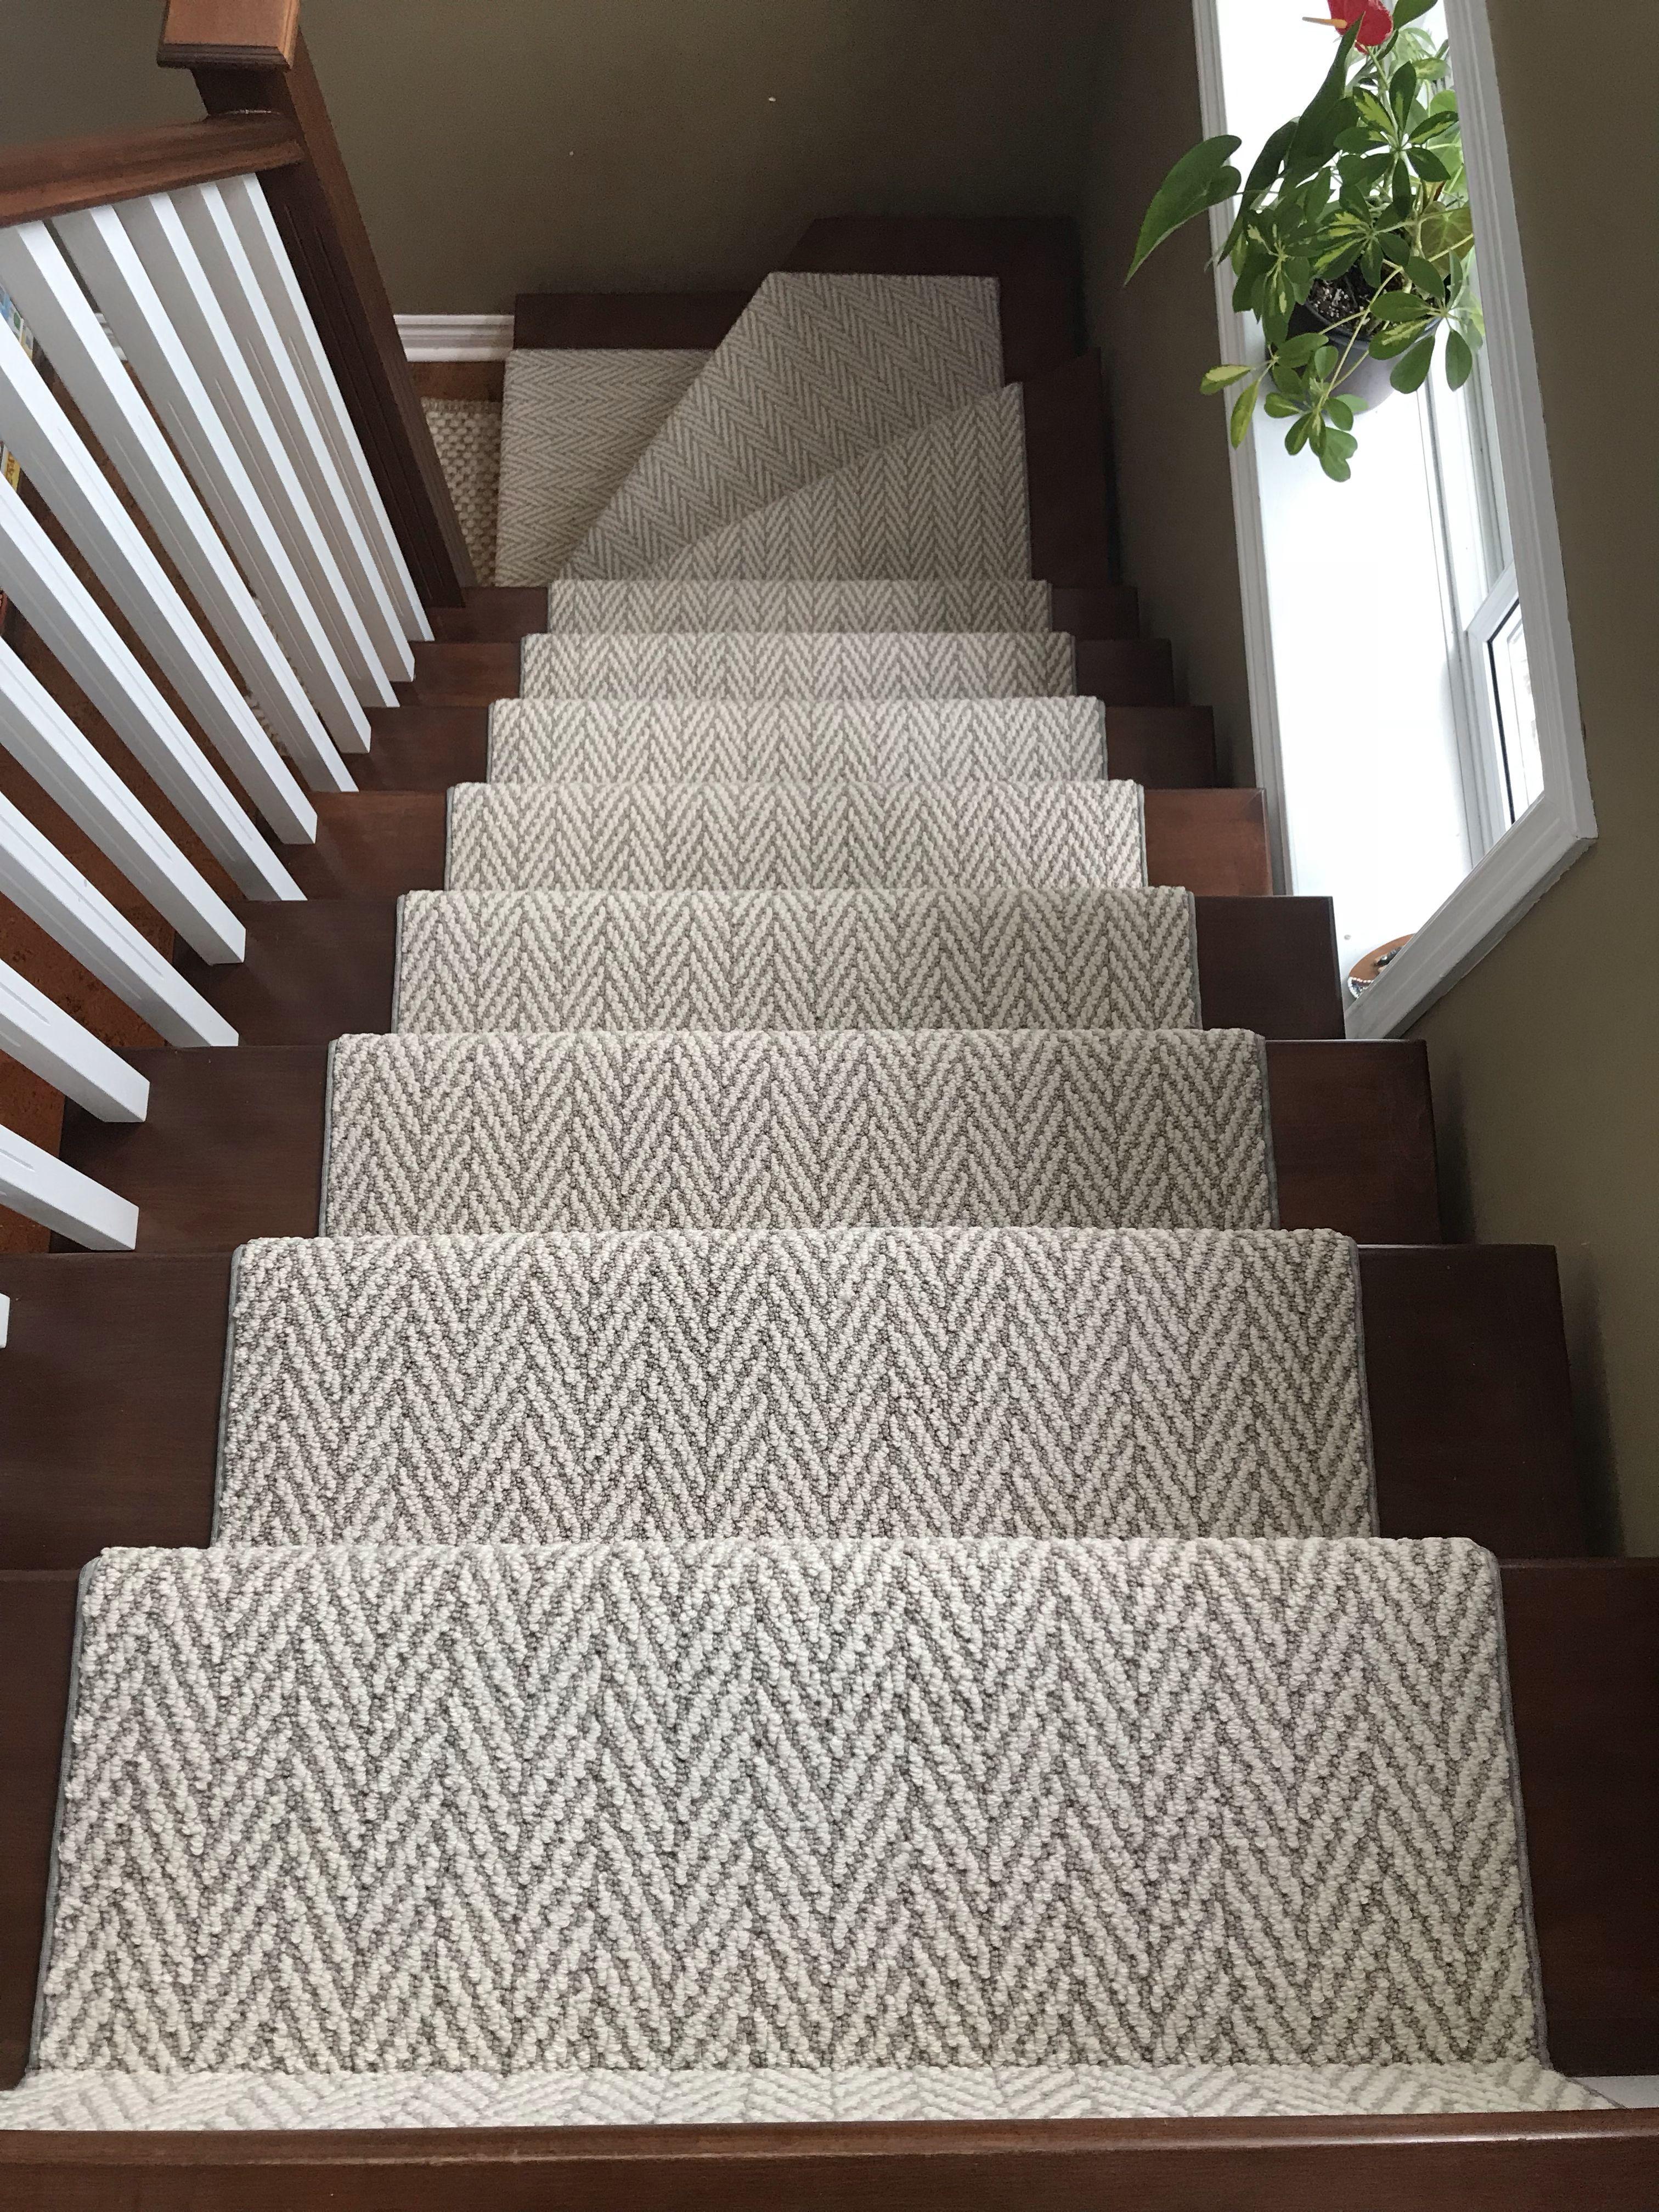 Stairs Runner Chevron Herringbone Runner Stair Runner In 2020